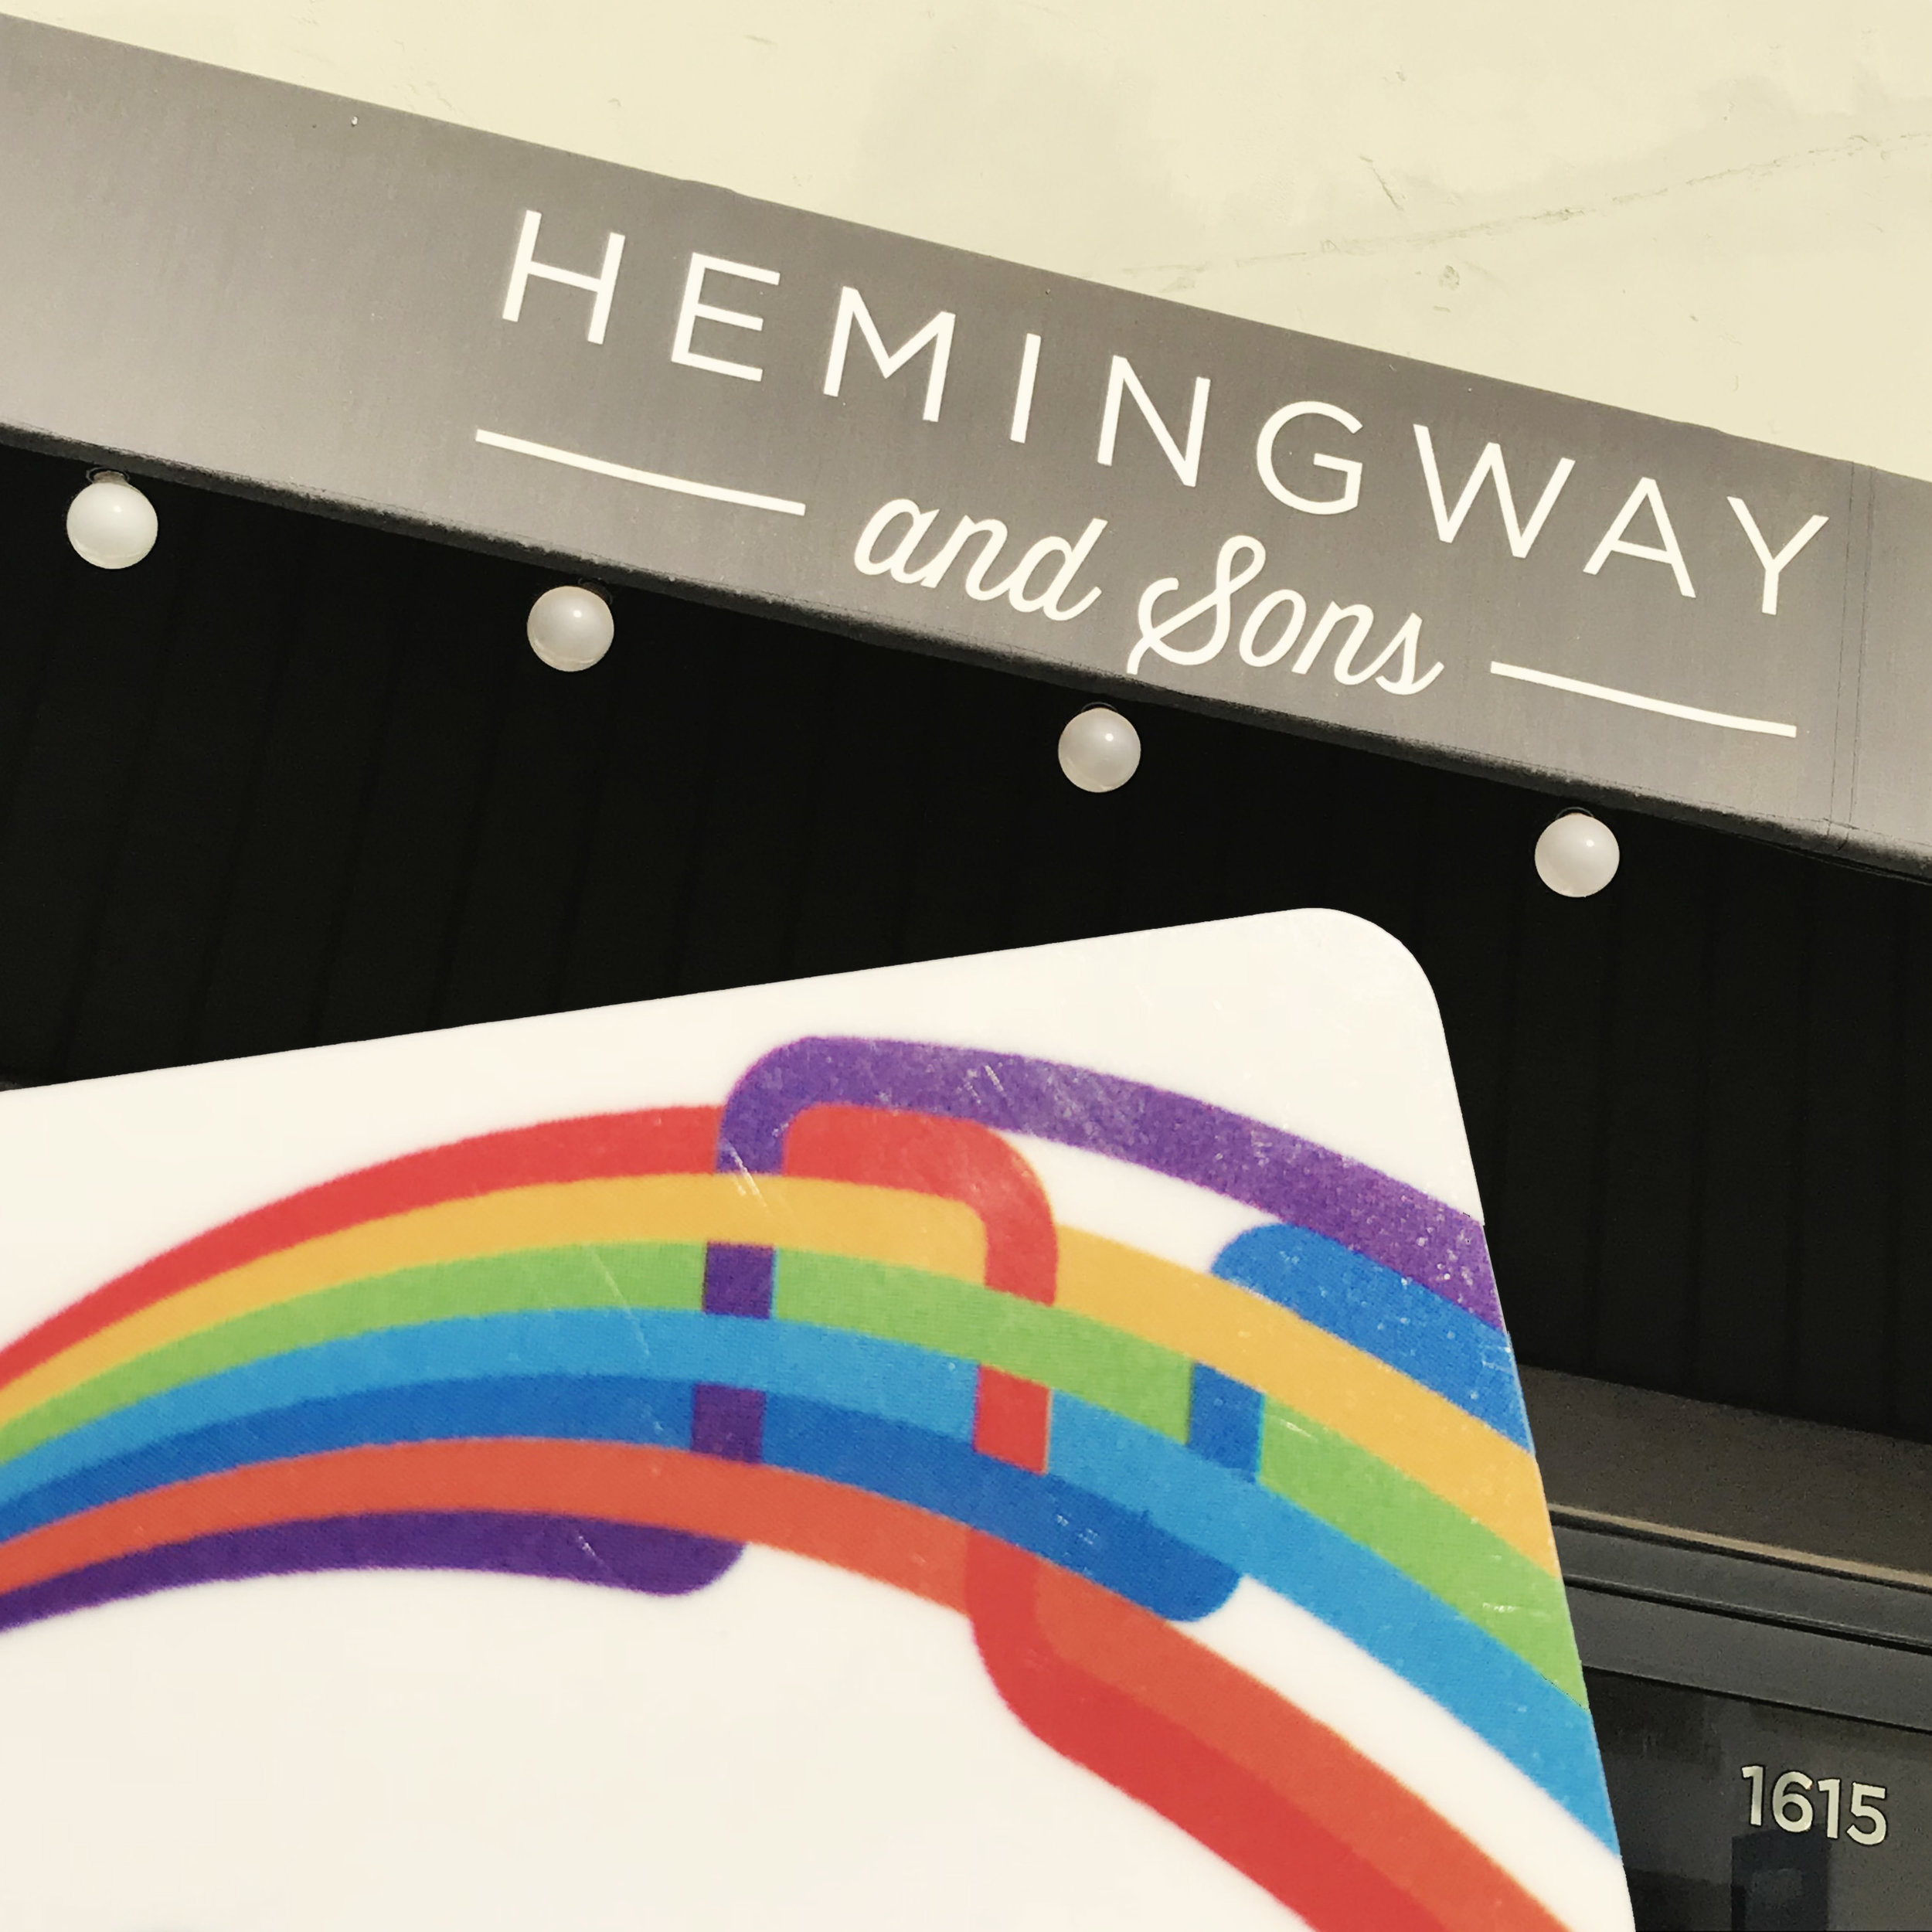 Hemingway&sons.jpg